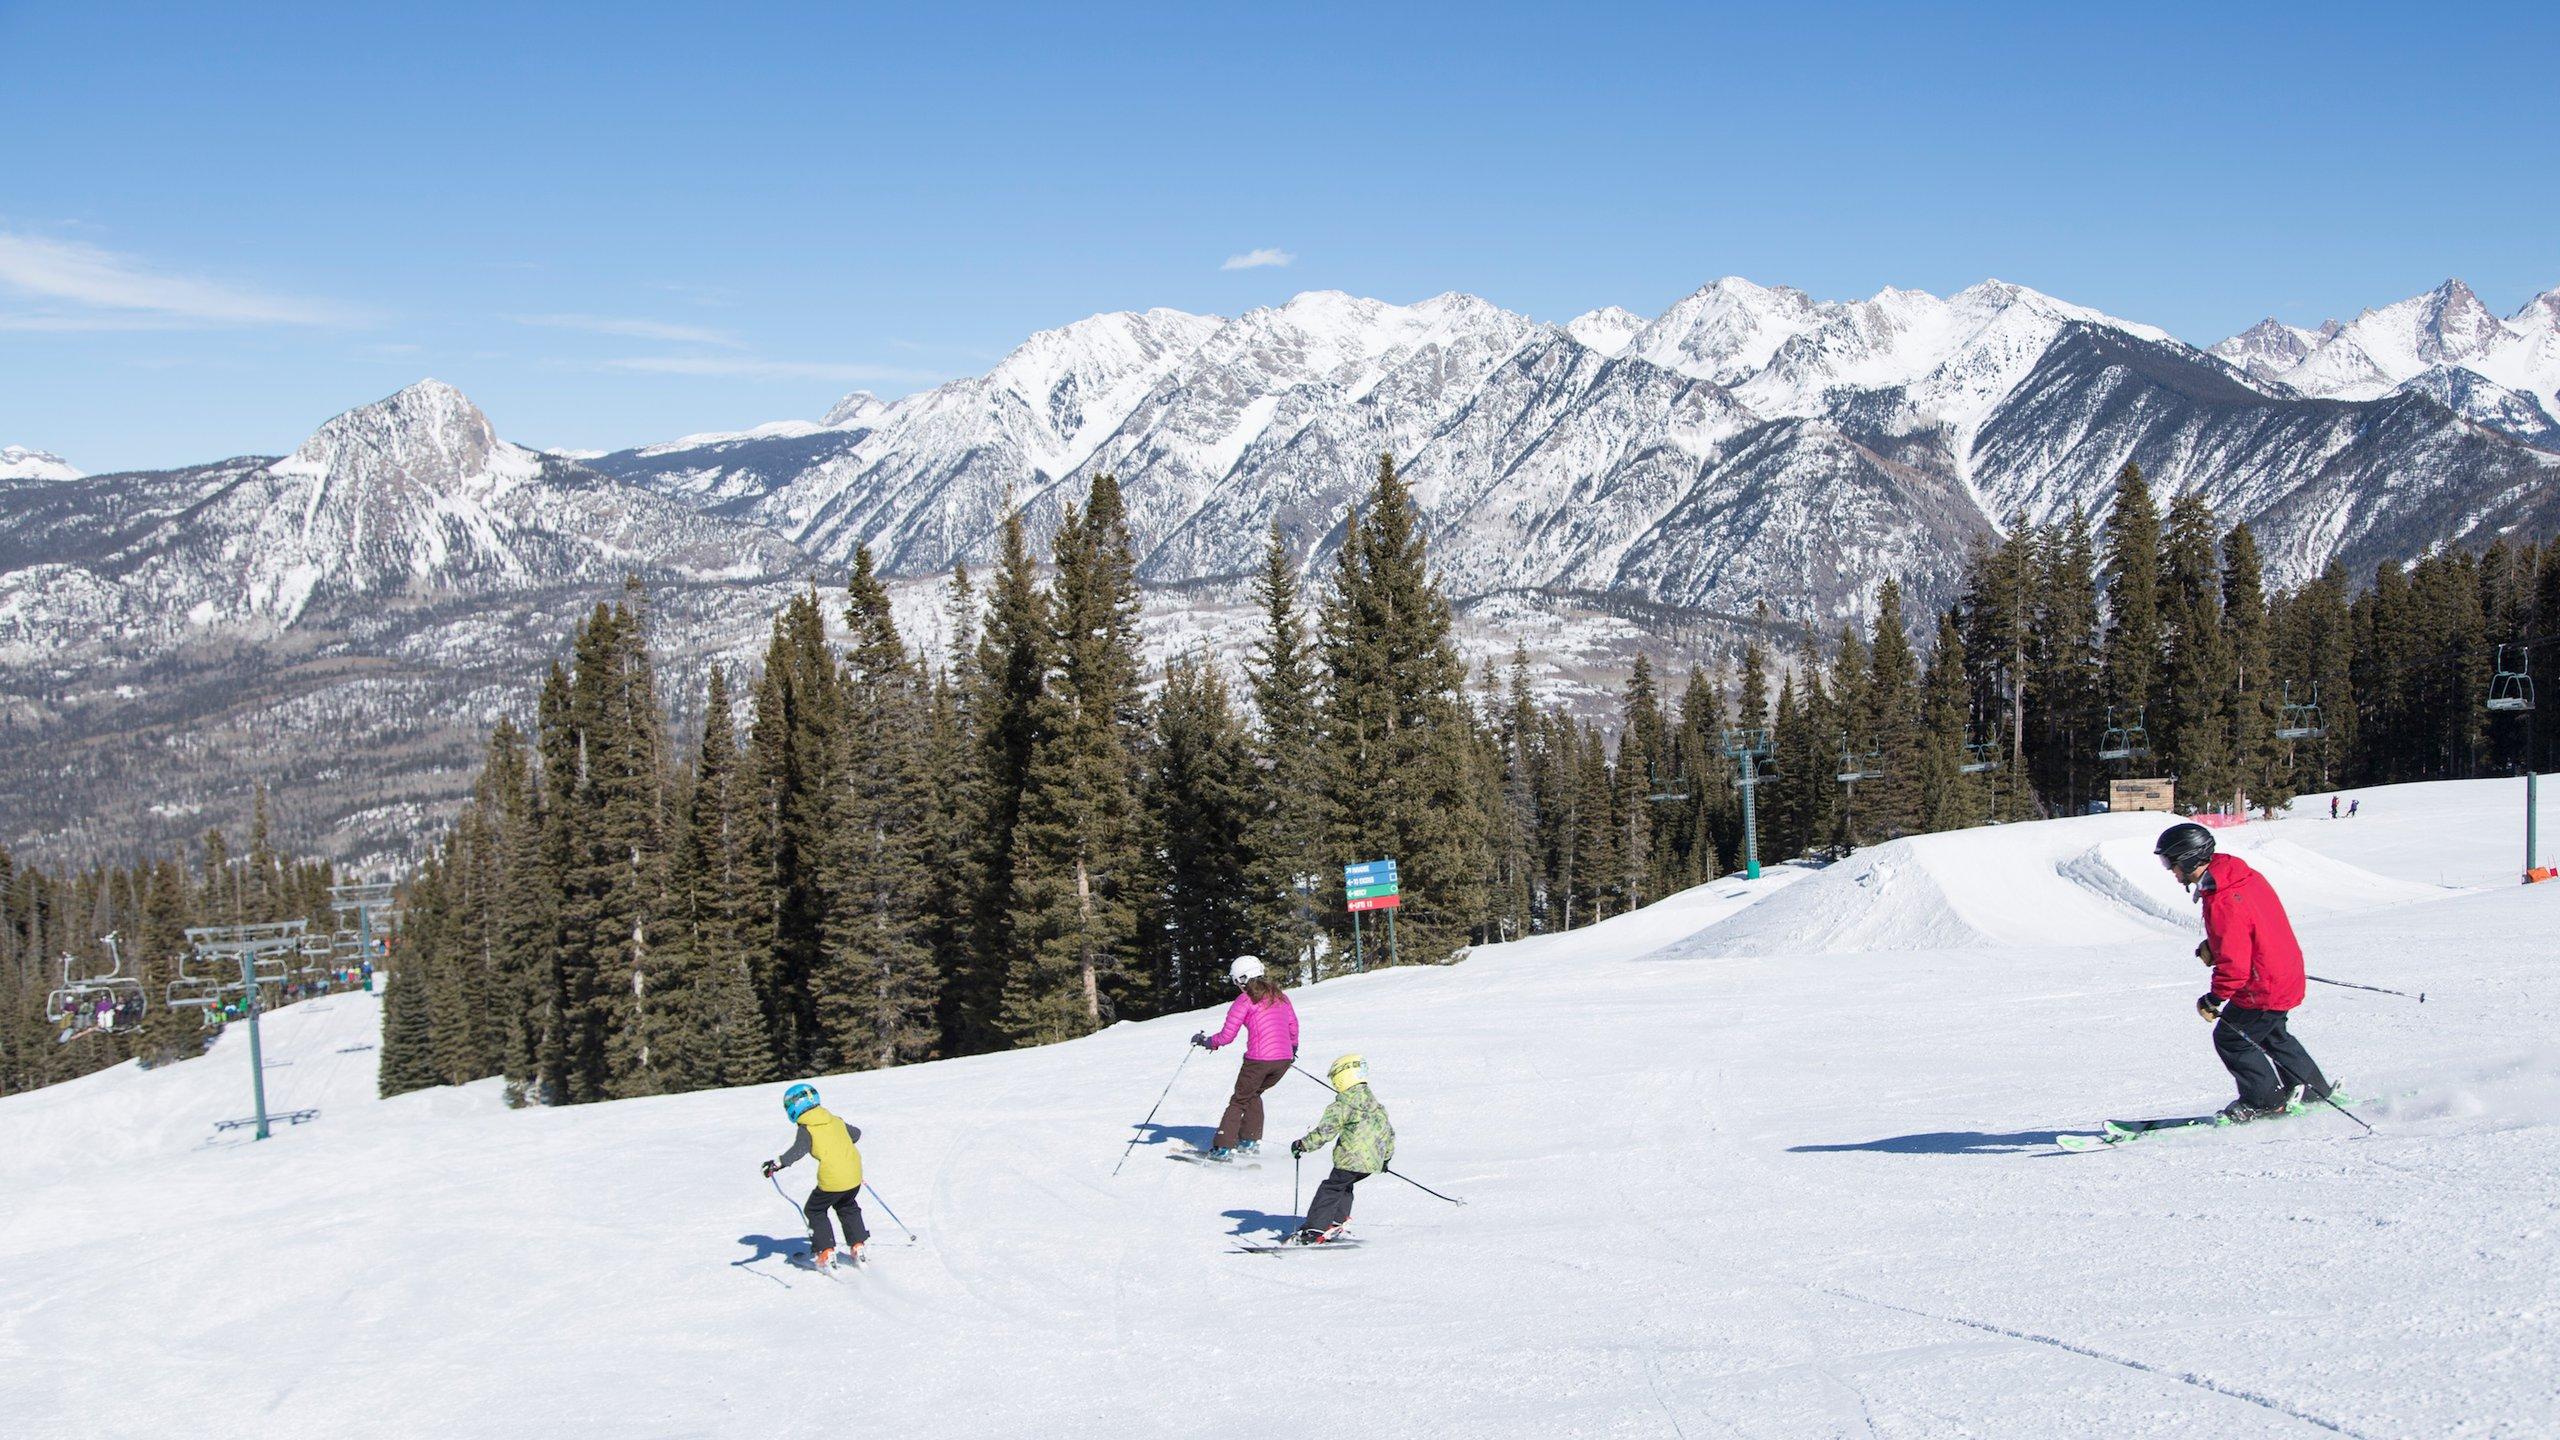 Top 10 Ski Resorts  Lodges in Durango  Purgatory CO 54